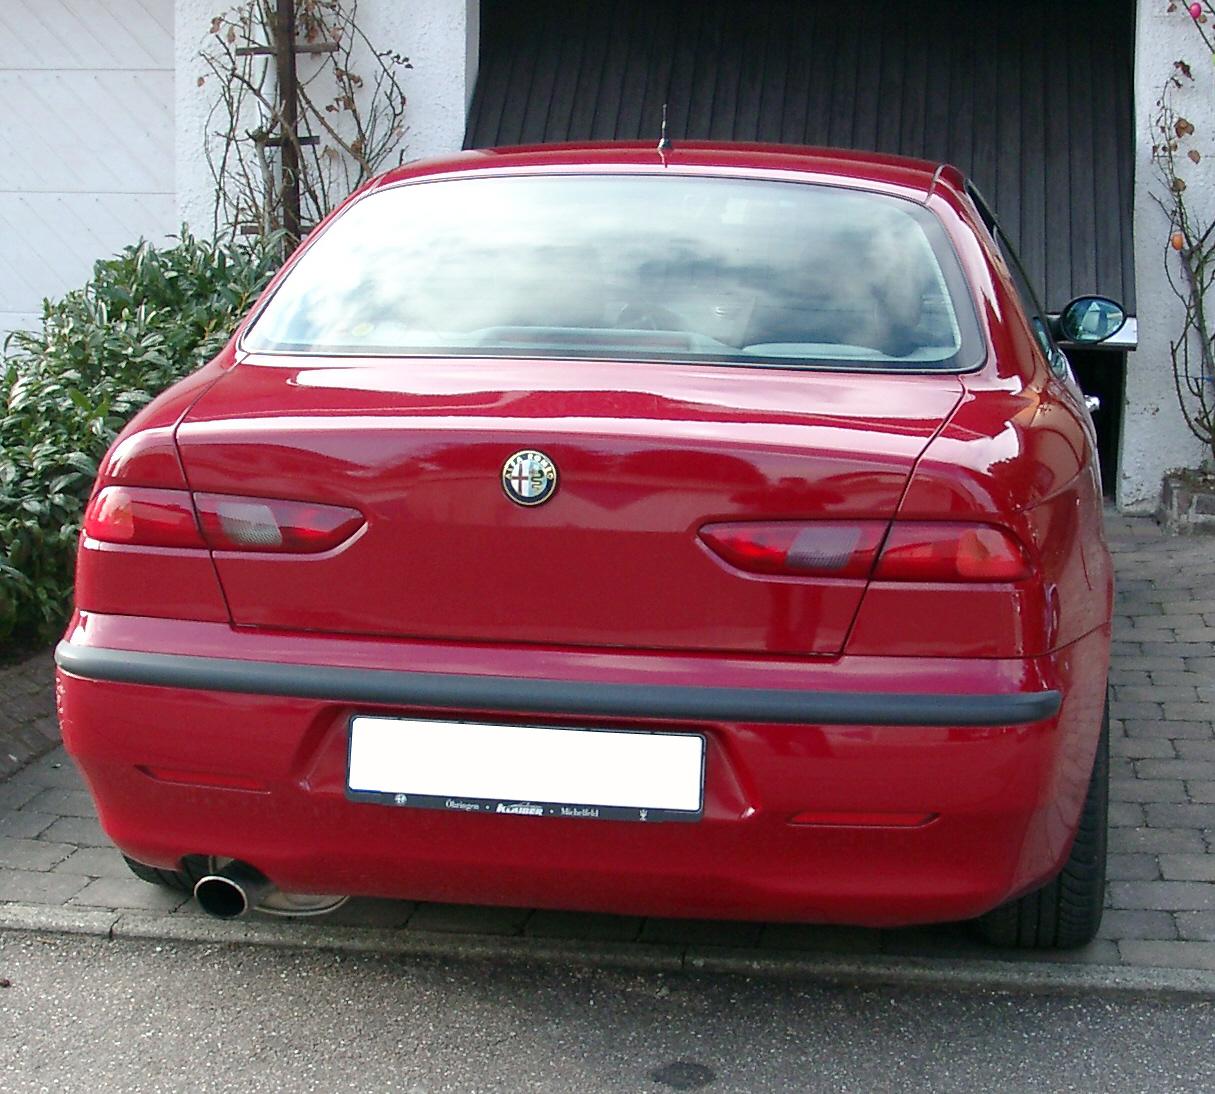 File:Alfa Romeo 156 Rear.jpg